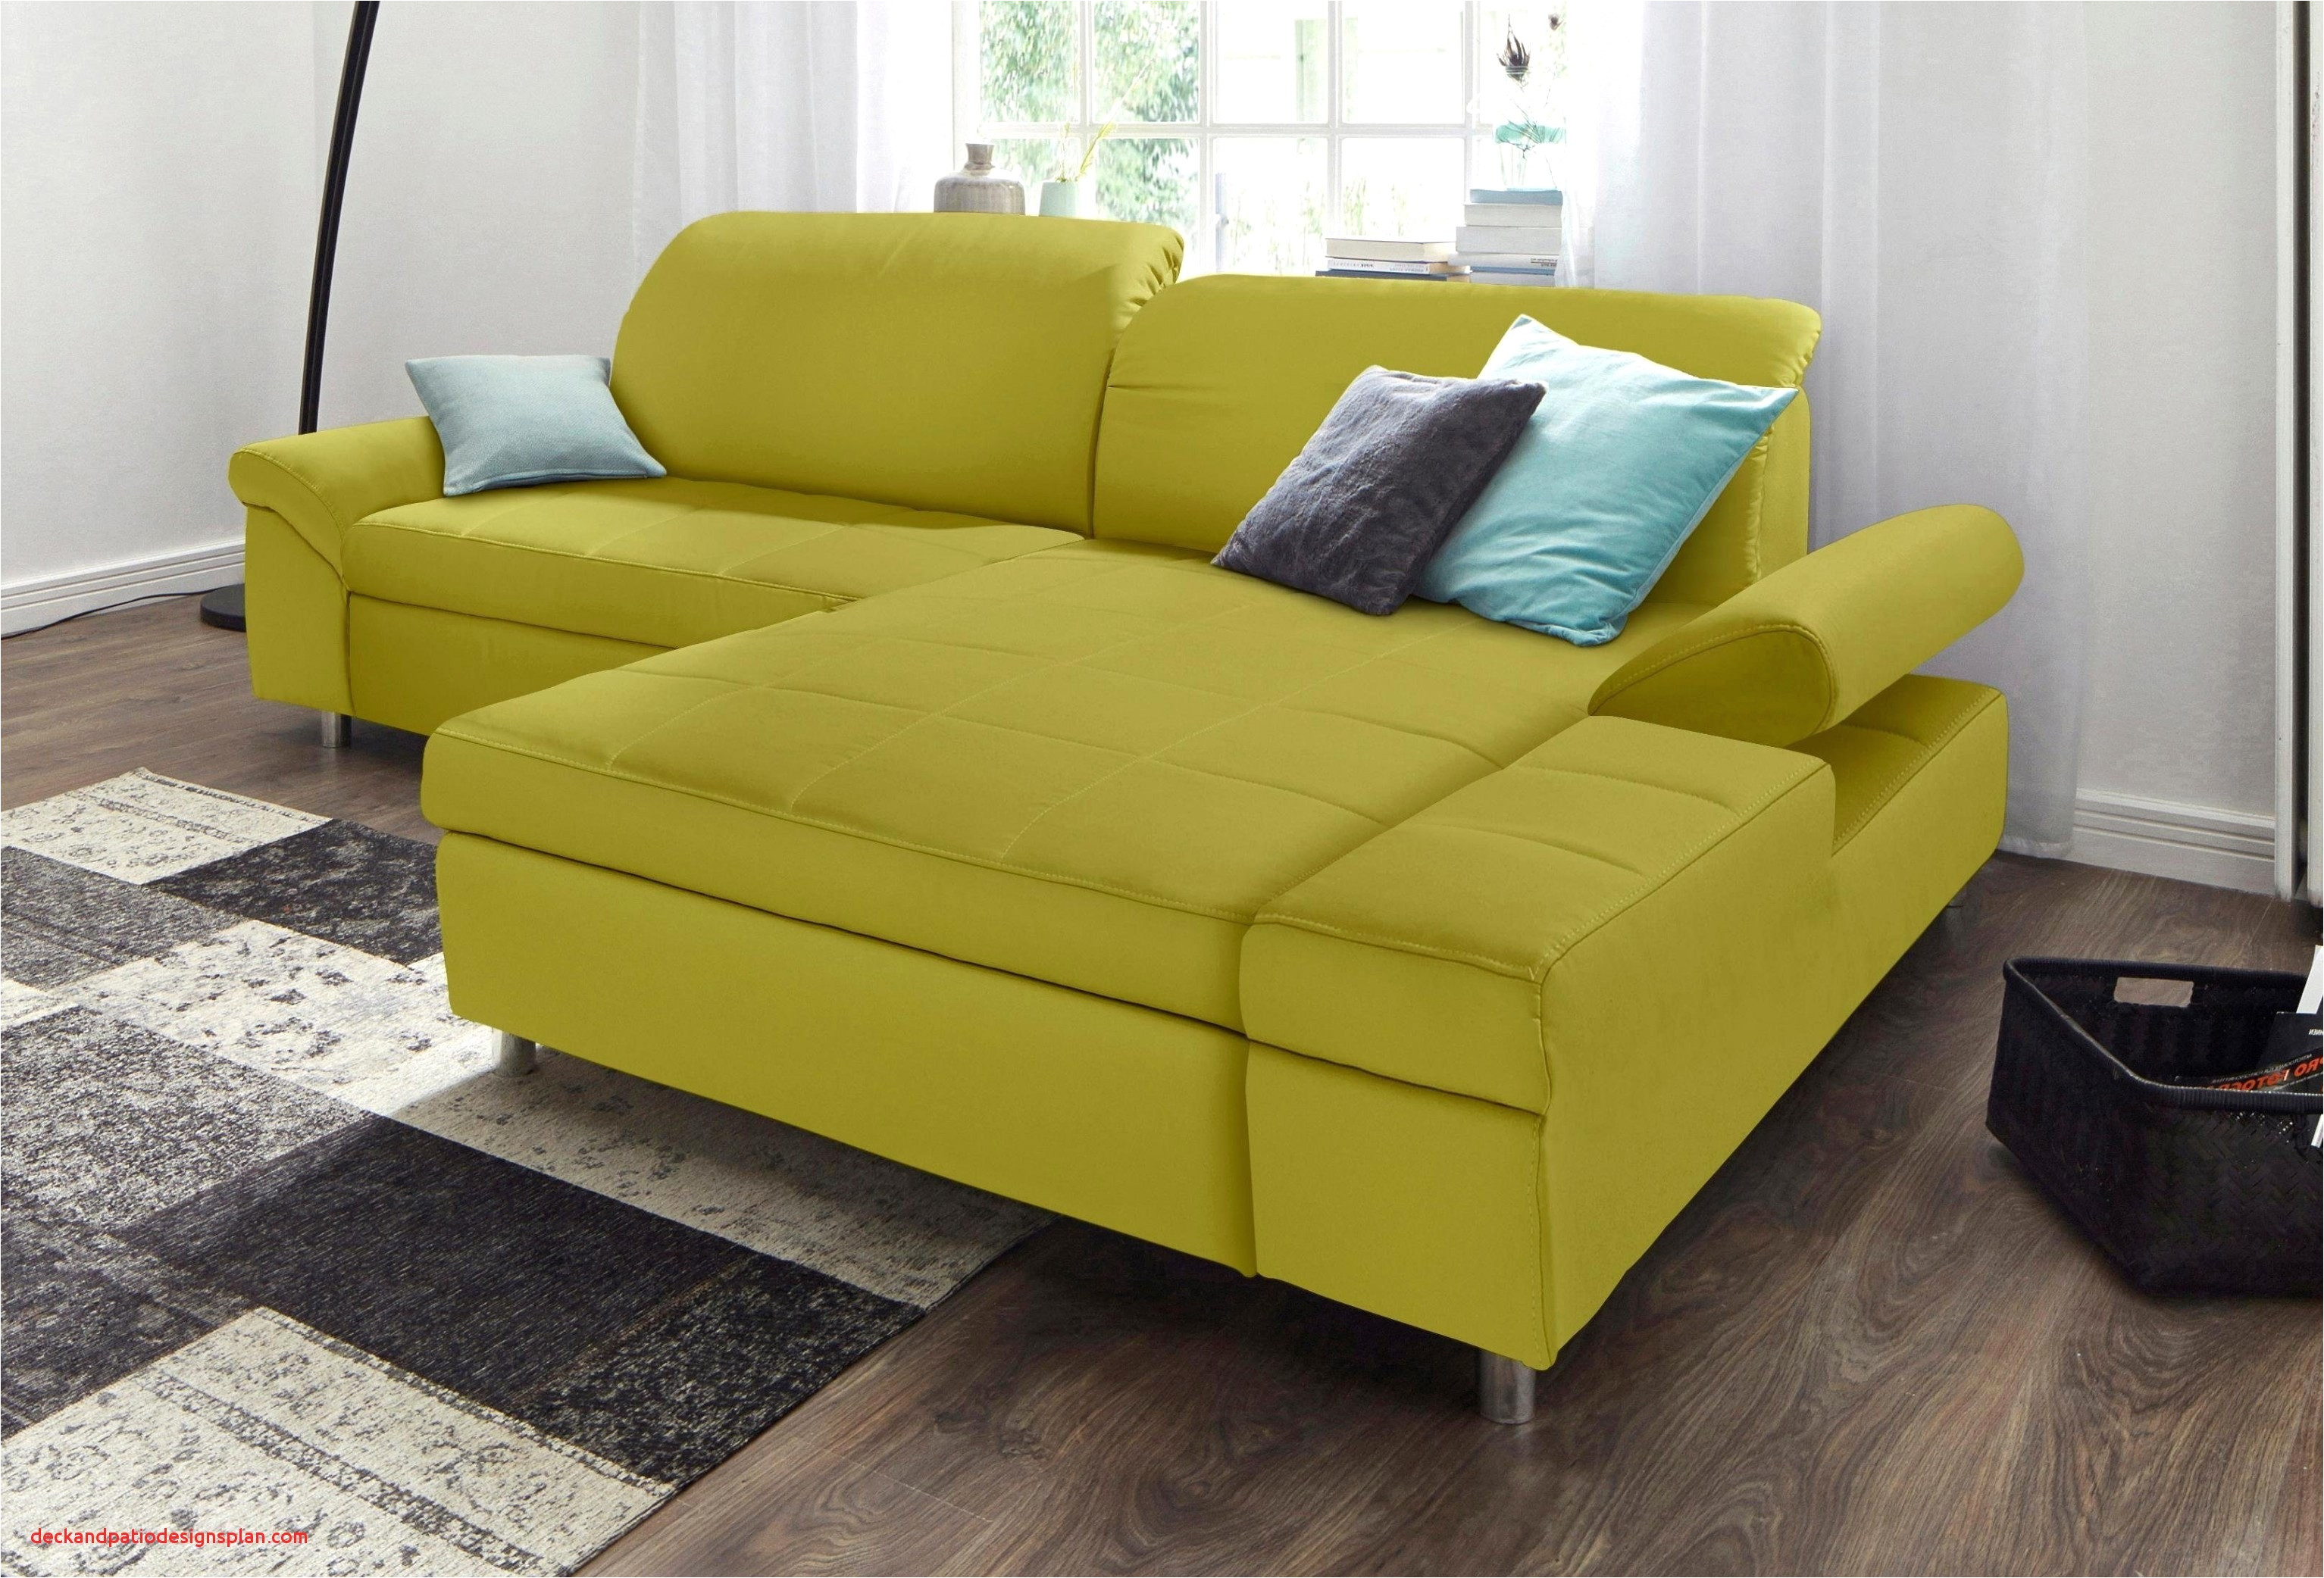 gute sofas beste sofa grau weis sofa ecke weiche sofas 0d mhccac ltc geschmackvoll foto of